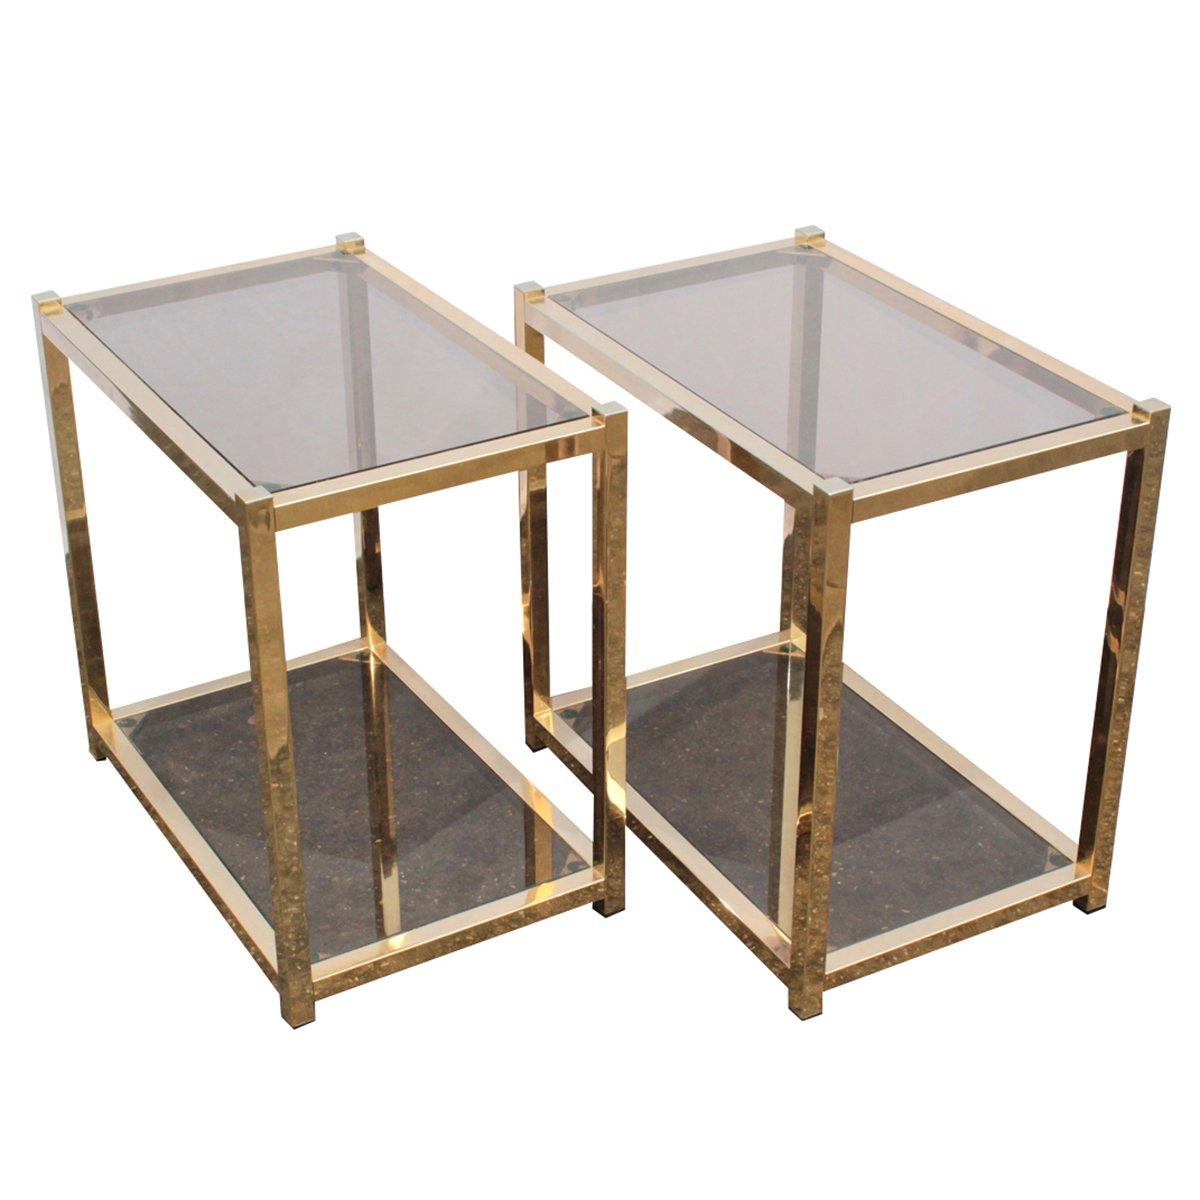 Merveilleux Vintage Outdoor Metal Side Table Designs